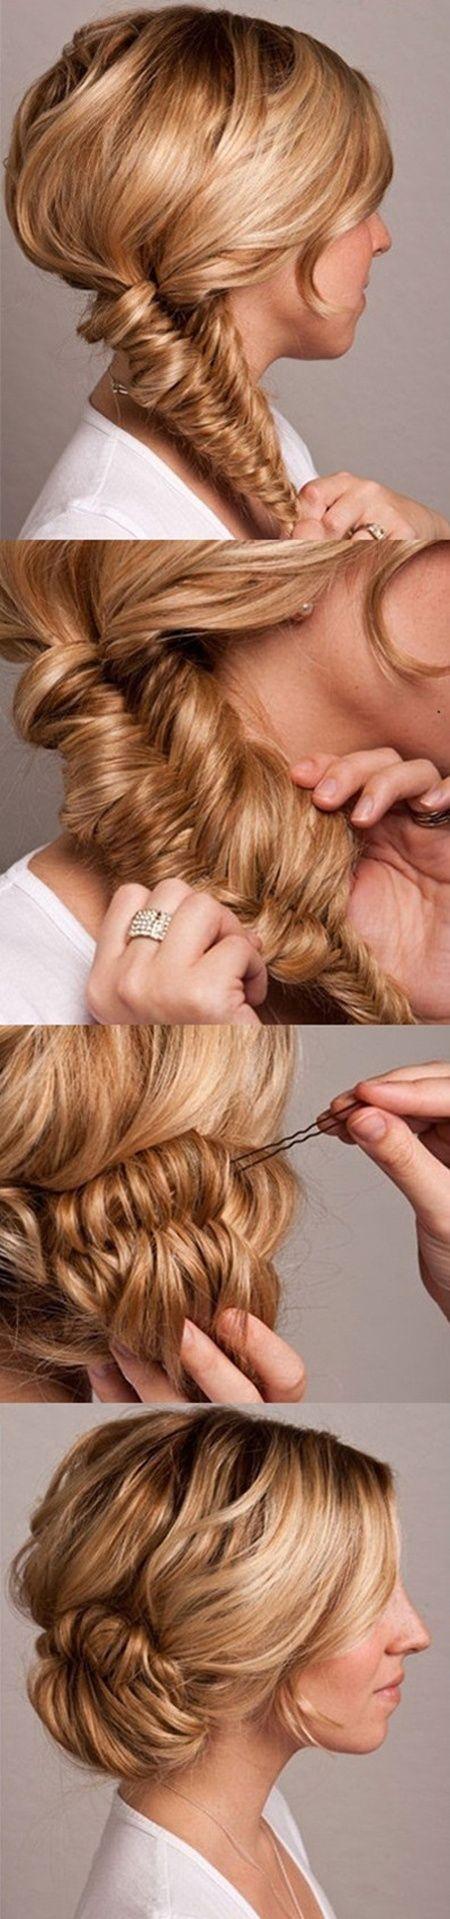 Fishtail Bun Wedding Hair Tutorial - hair-sublime.com